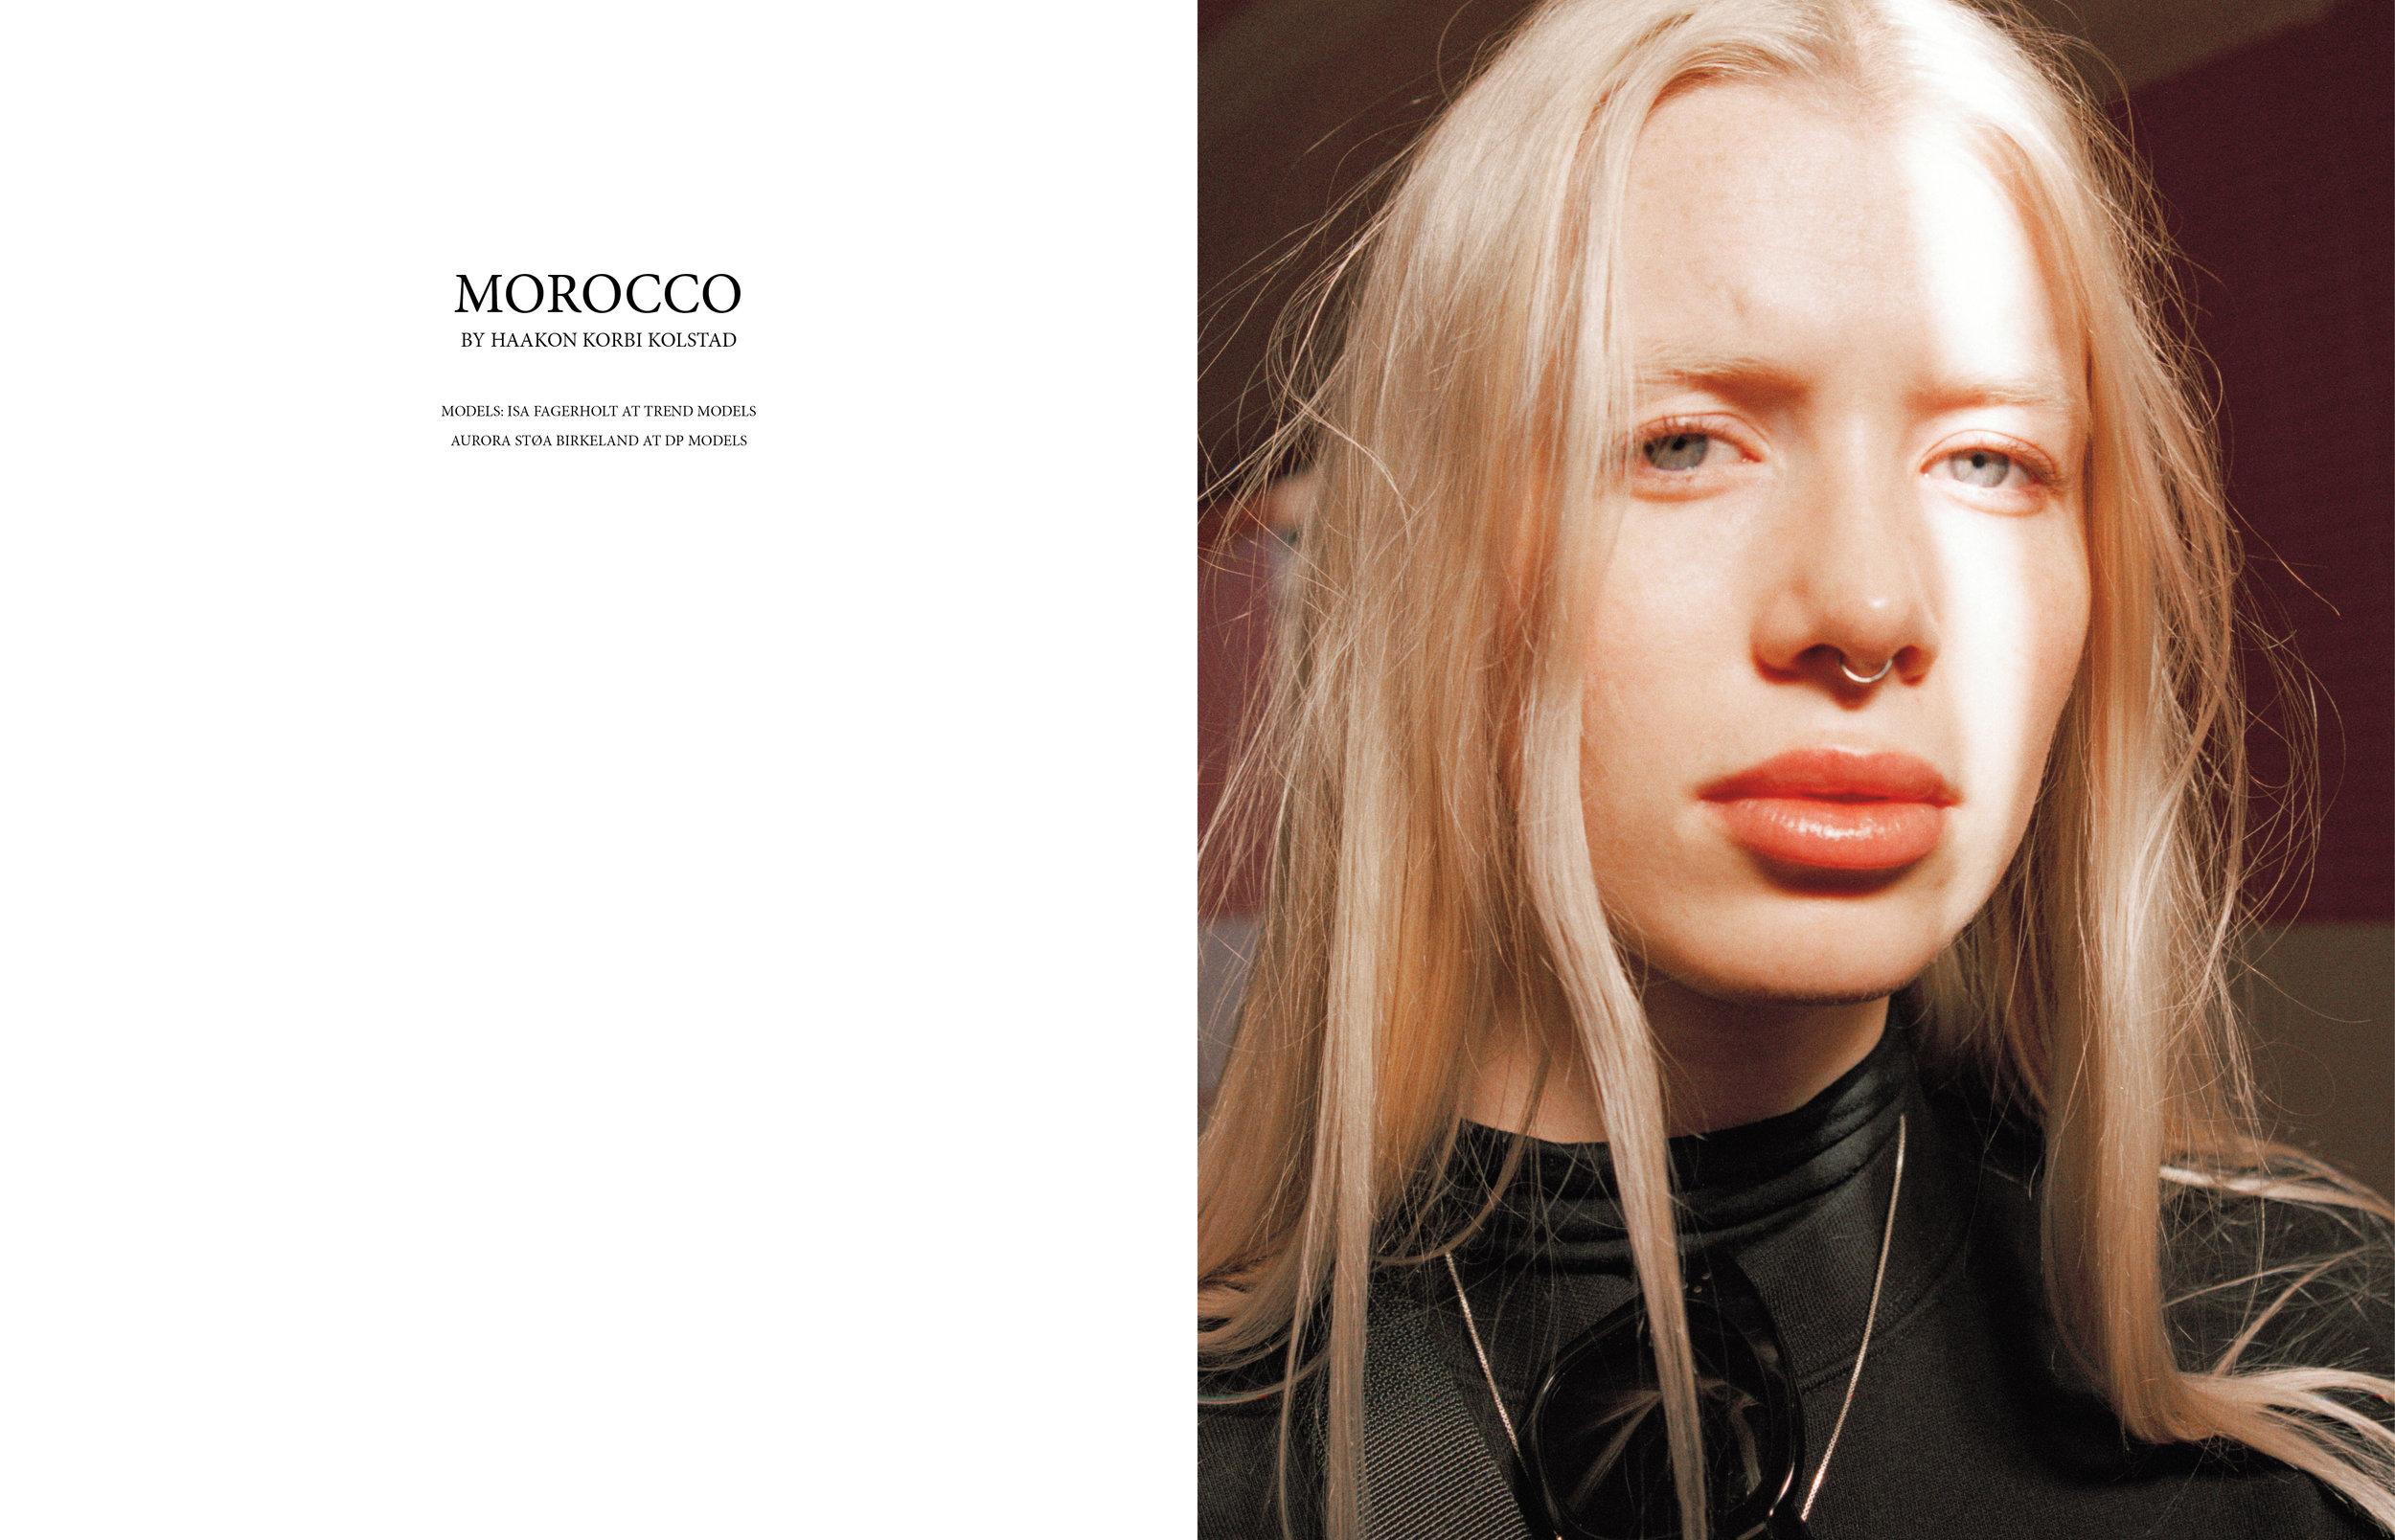 HaakonKK_Morocco_Spreads_Lowres2.jpg